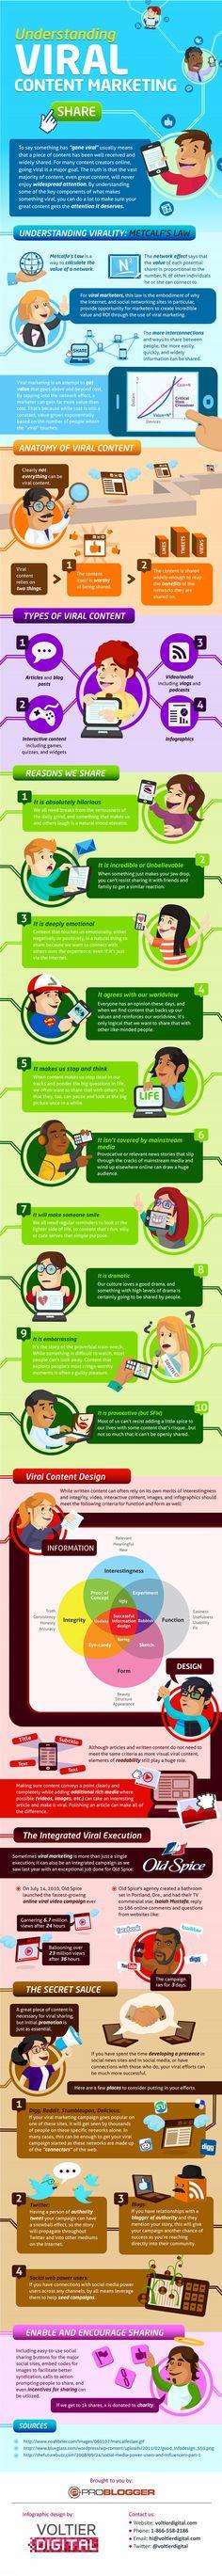 Understanding Viral Content Marketing #Infographic